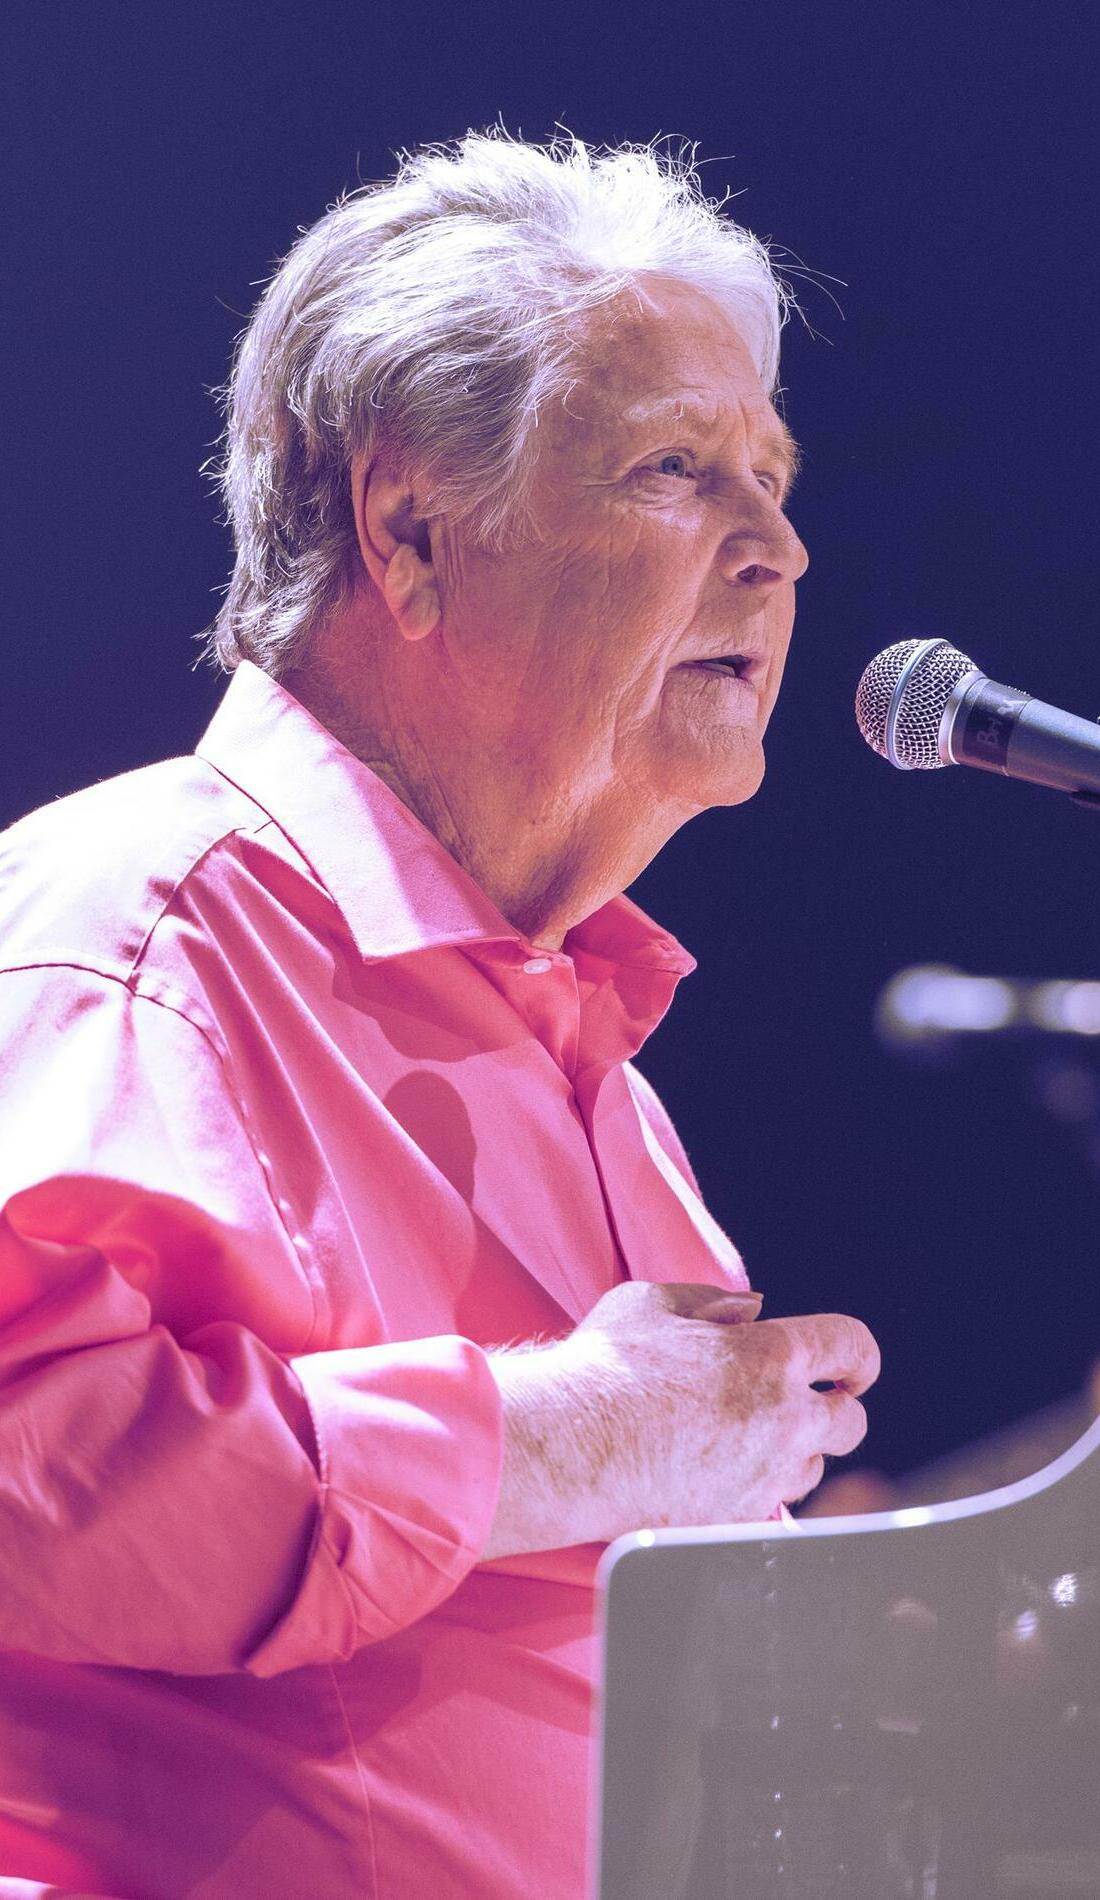 A Brian Wilson live event